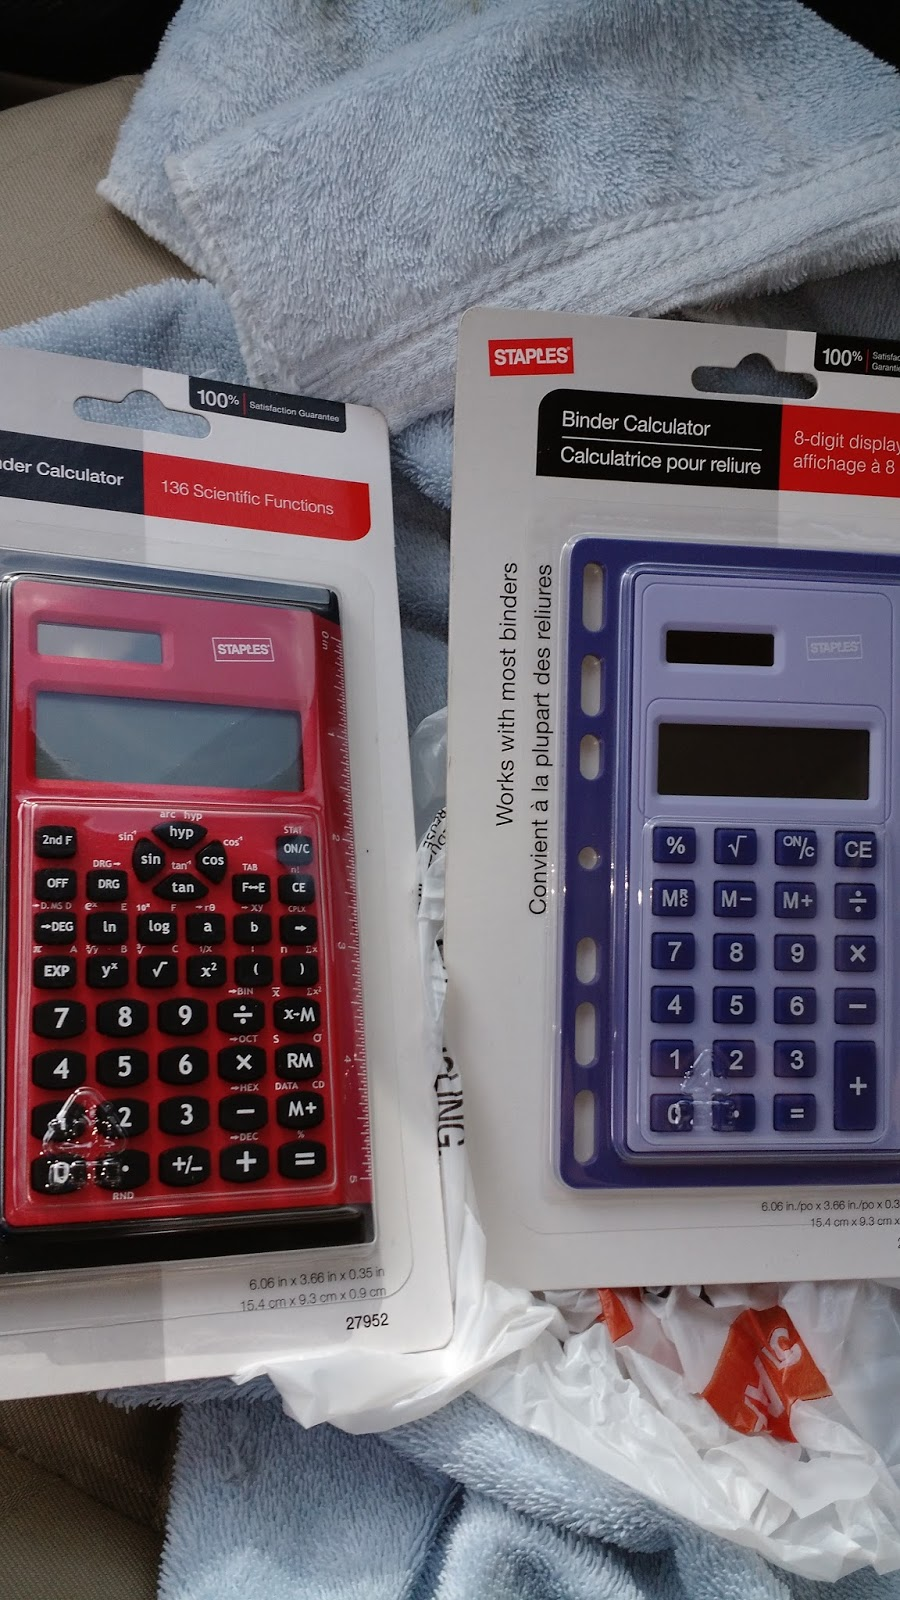 eddie s math and calculator blog staples binder ruler scientific